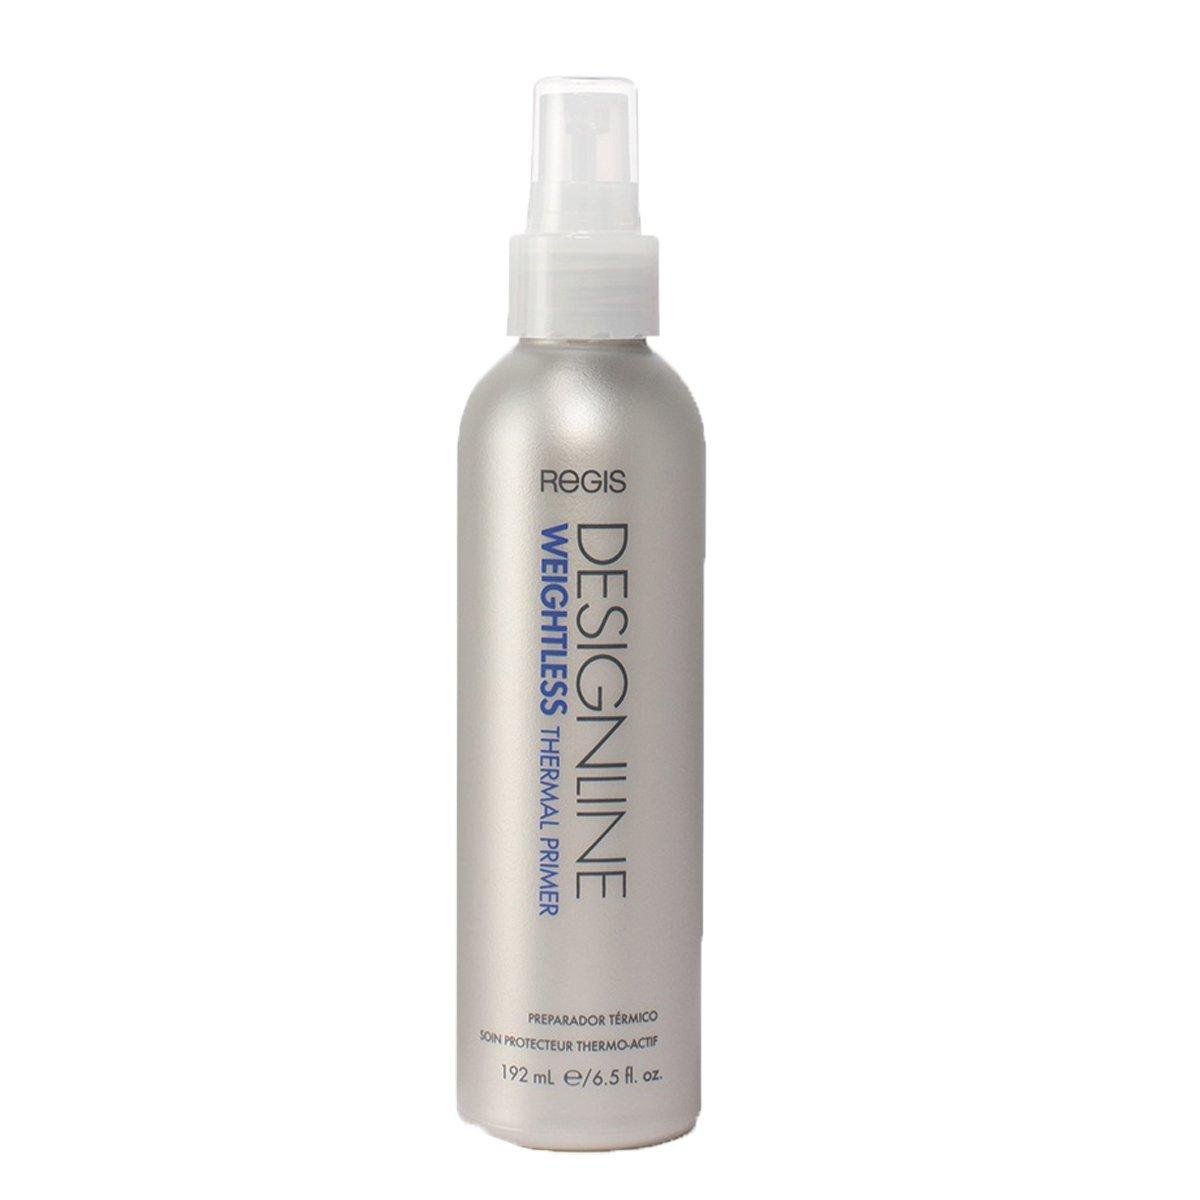 Weightless Thermal Primer, 6.5 oz - Regis DESIGNLINE - Softening, Detangling, Smoothing, and Strengthening Hair Primer (6.5 oz) by DESIGNLINE